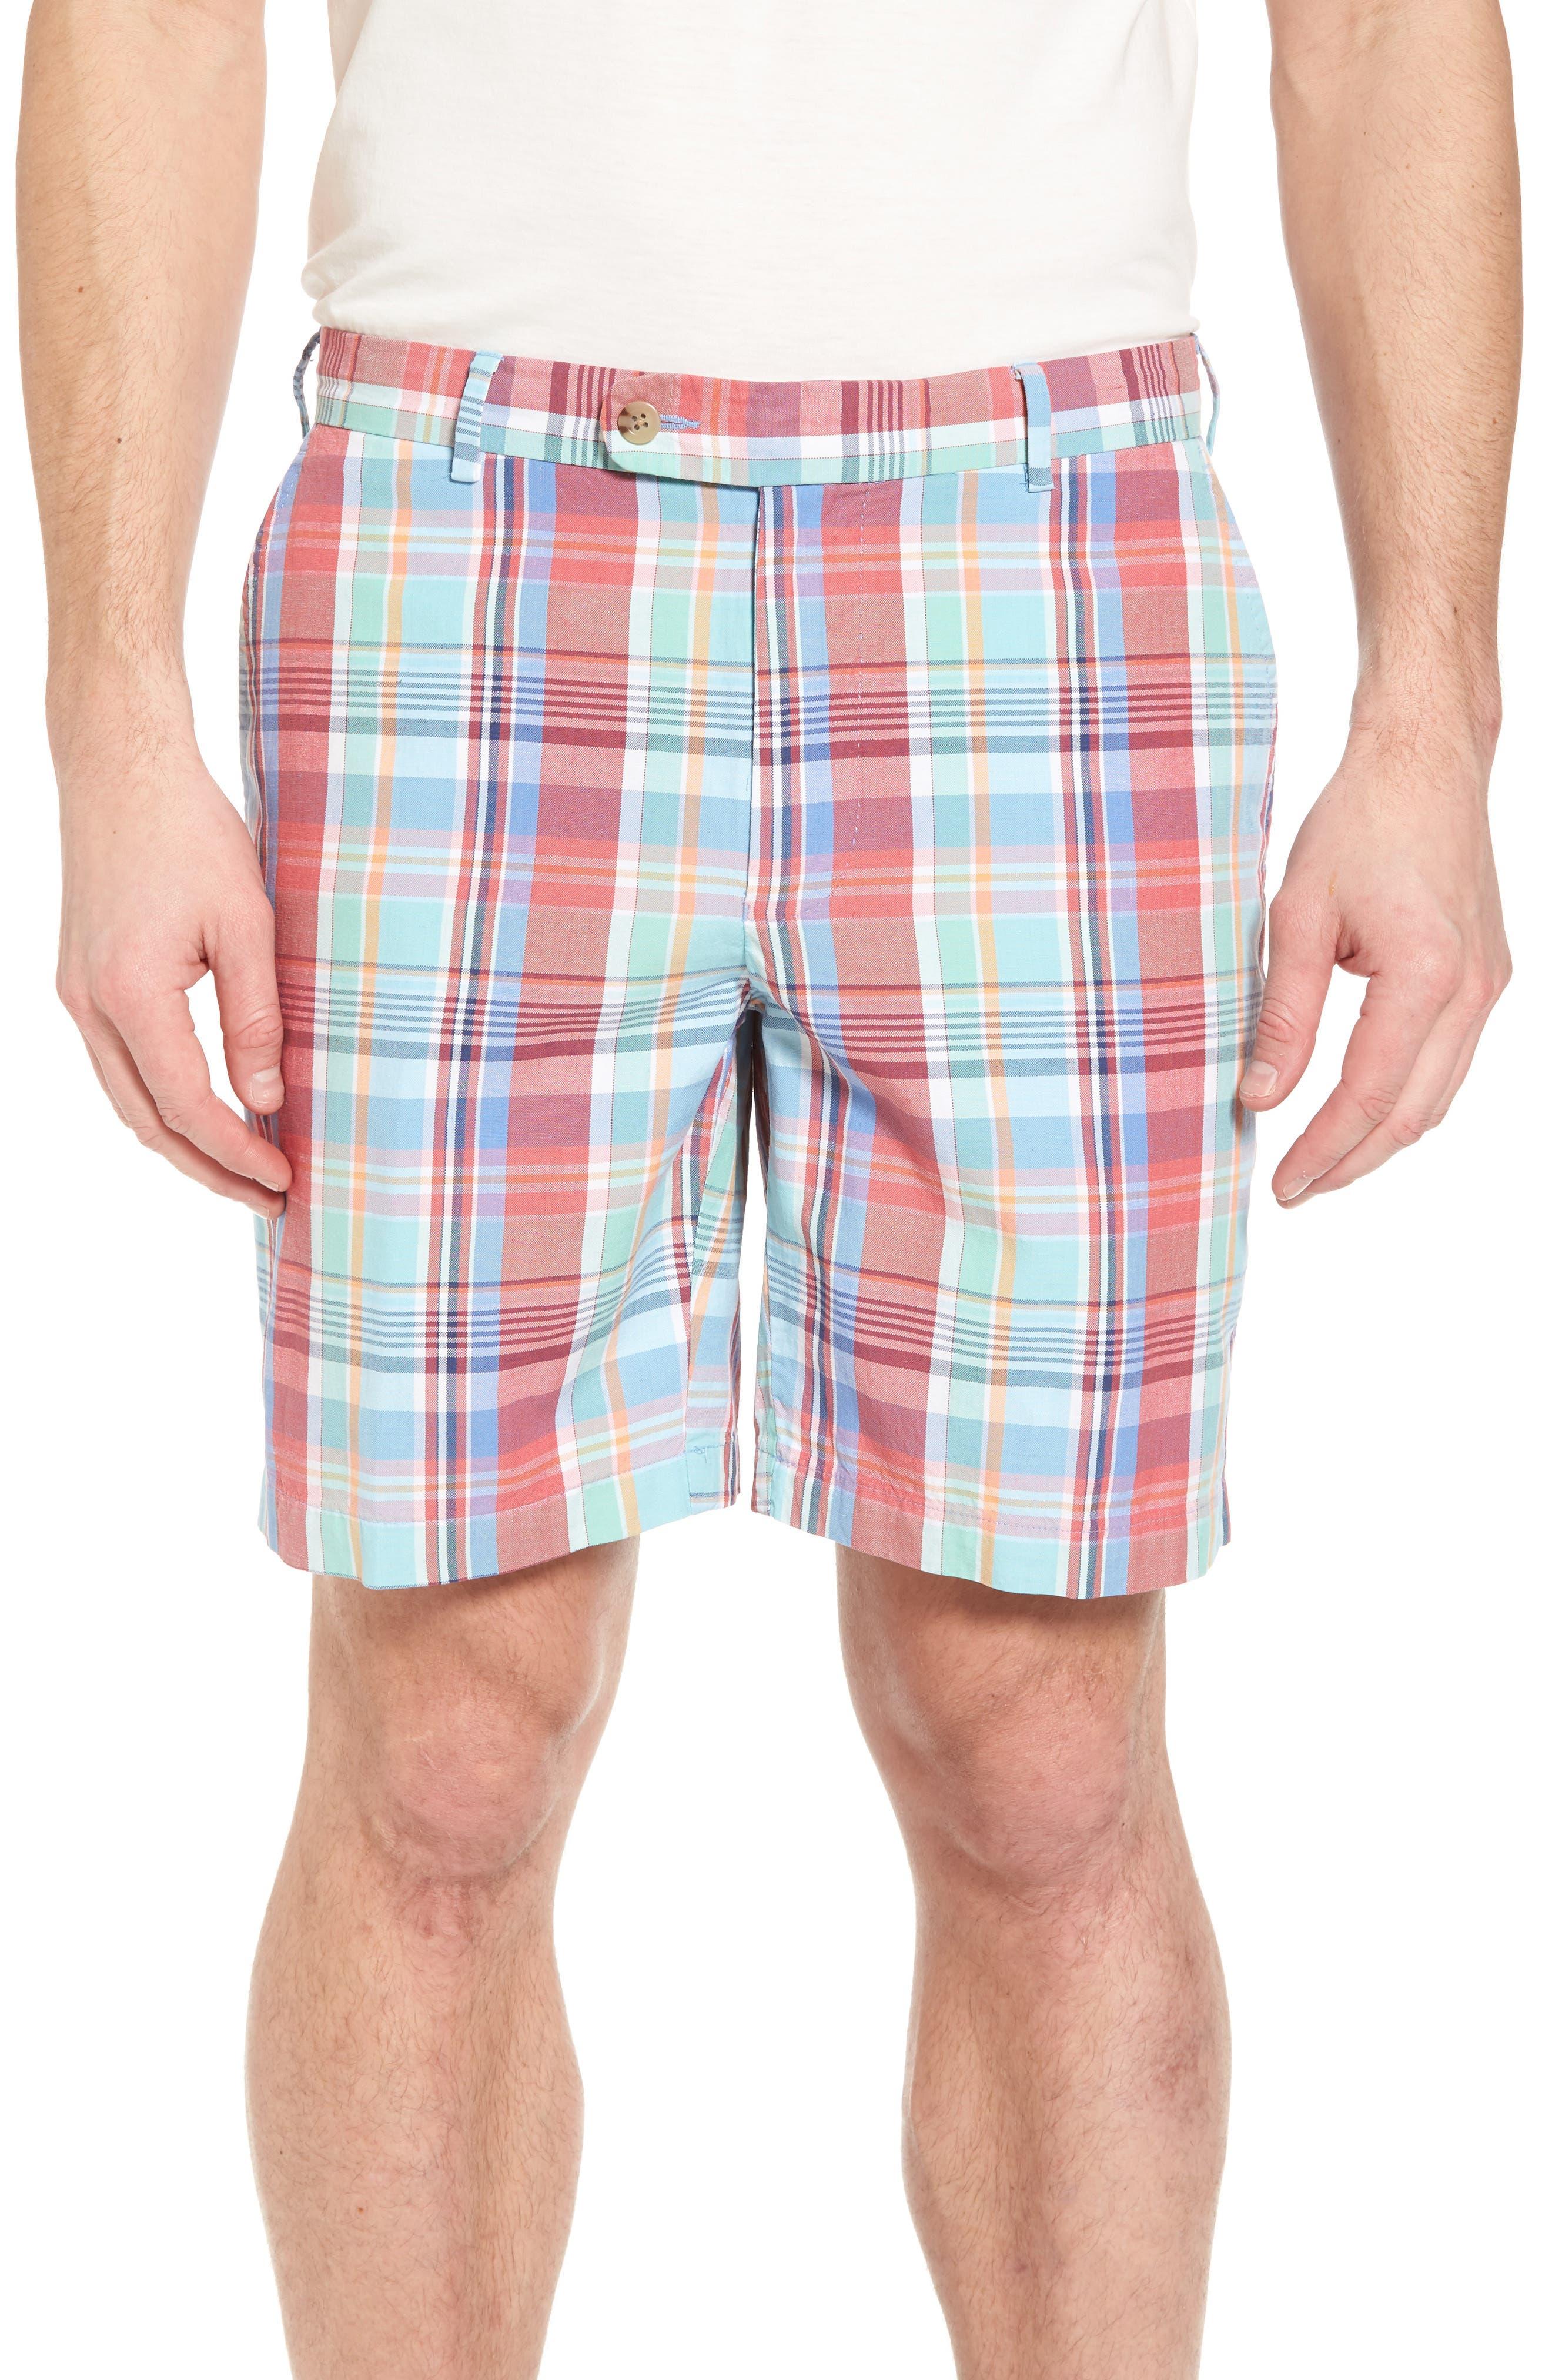 Seaside Madras Plaid Shorts,                         Main,                         color, Cape Red